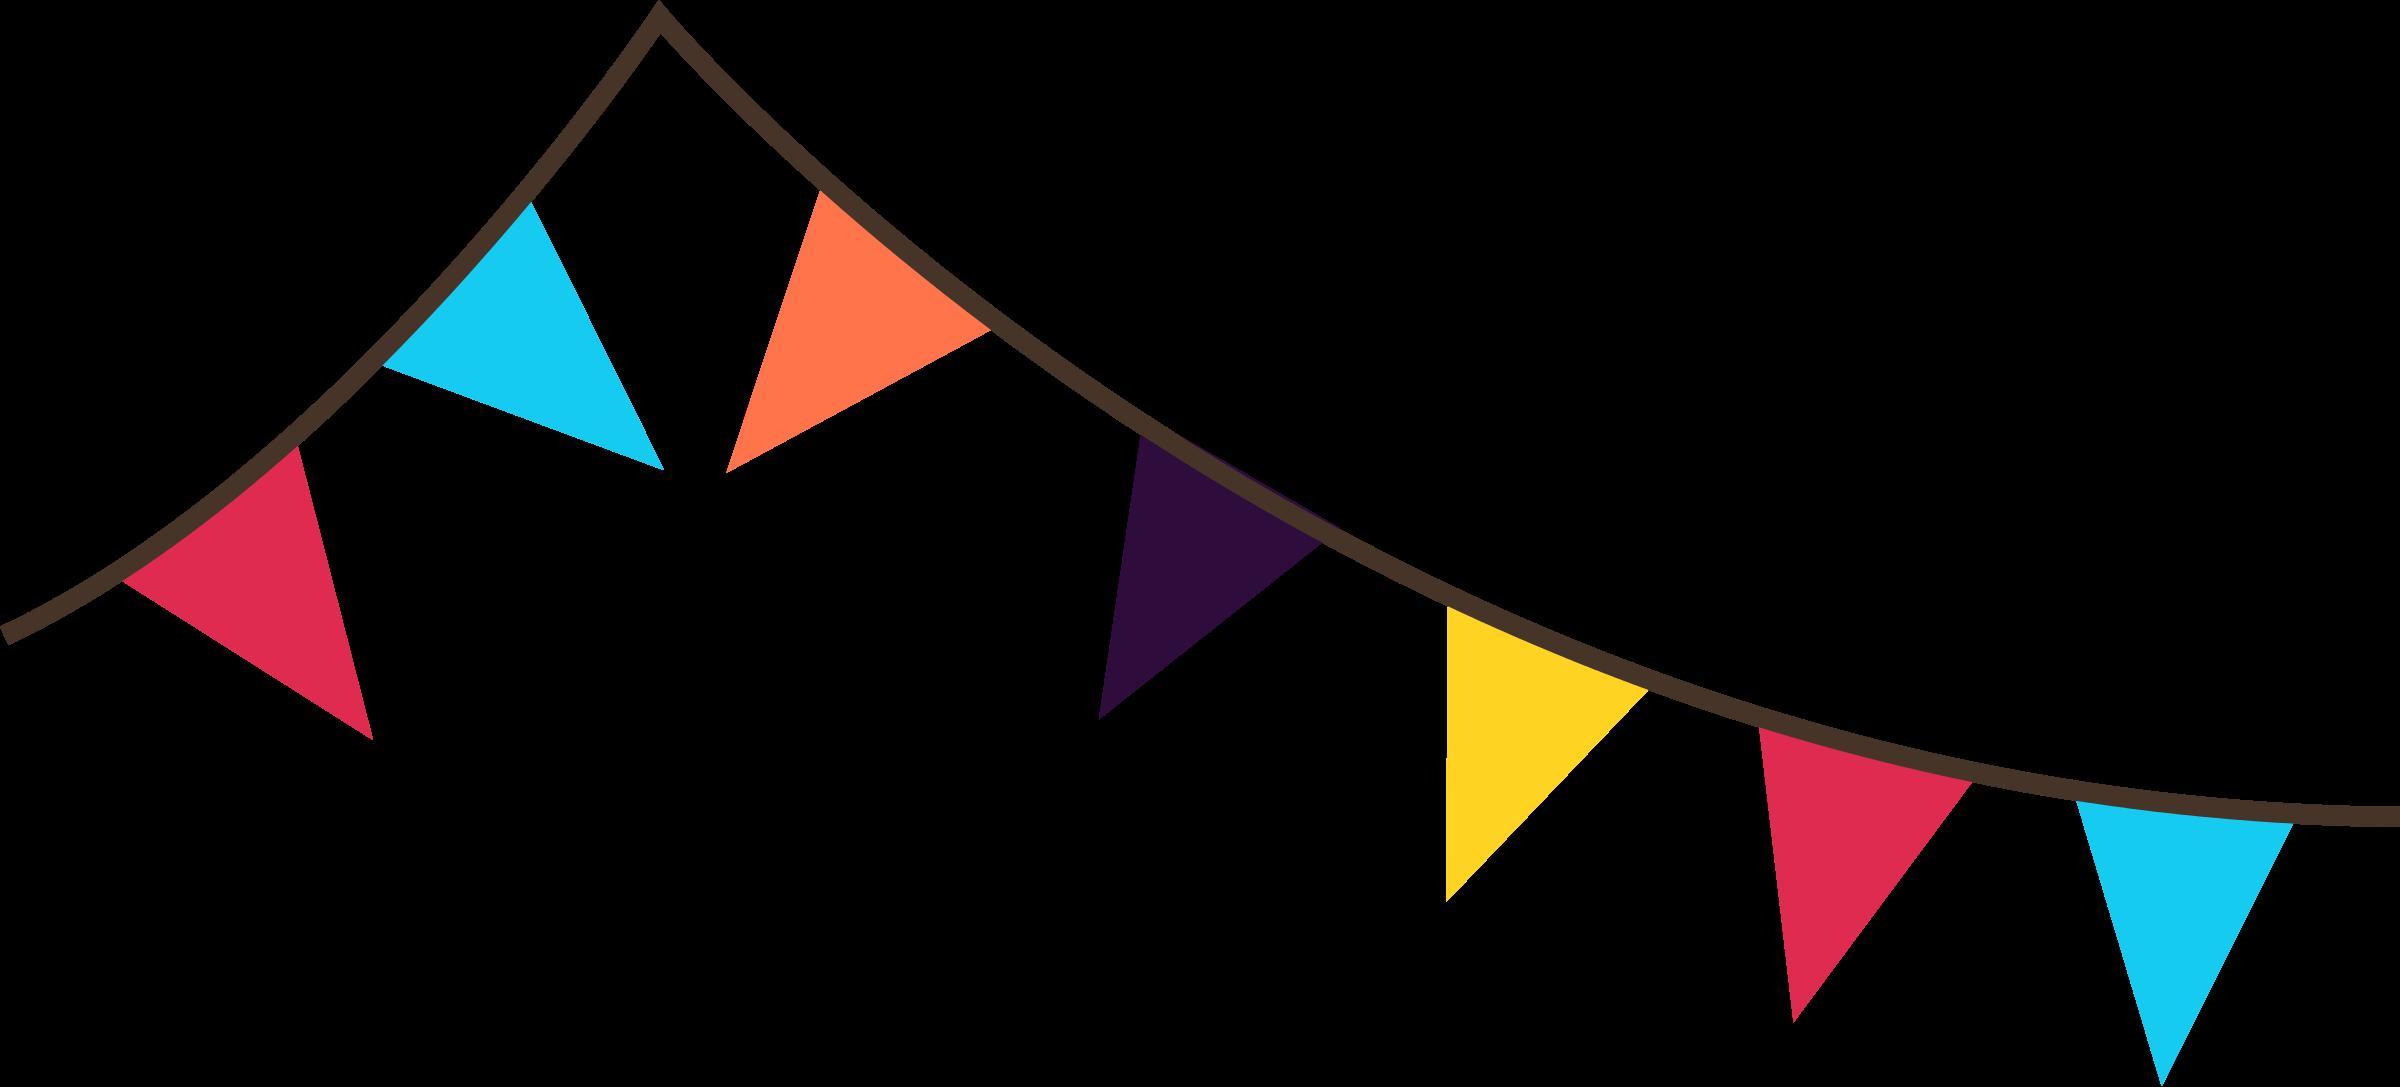 Free pennant banner.